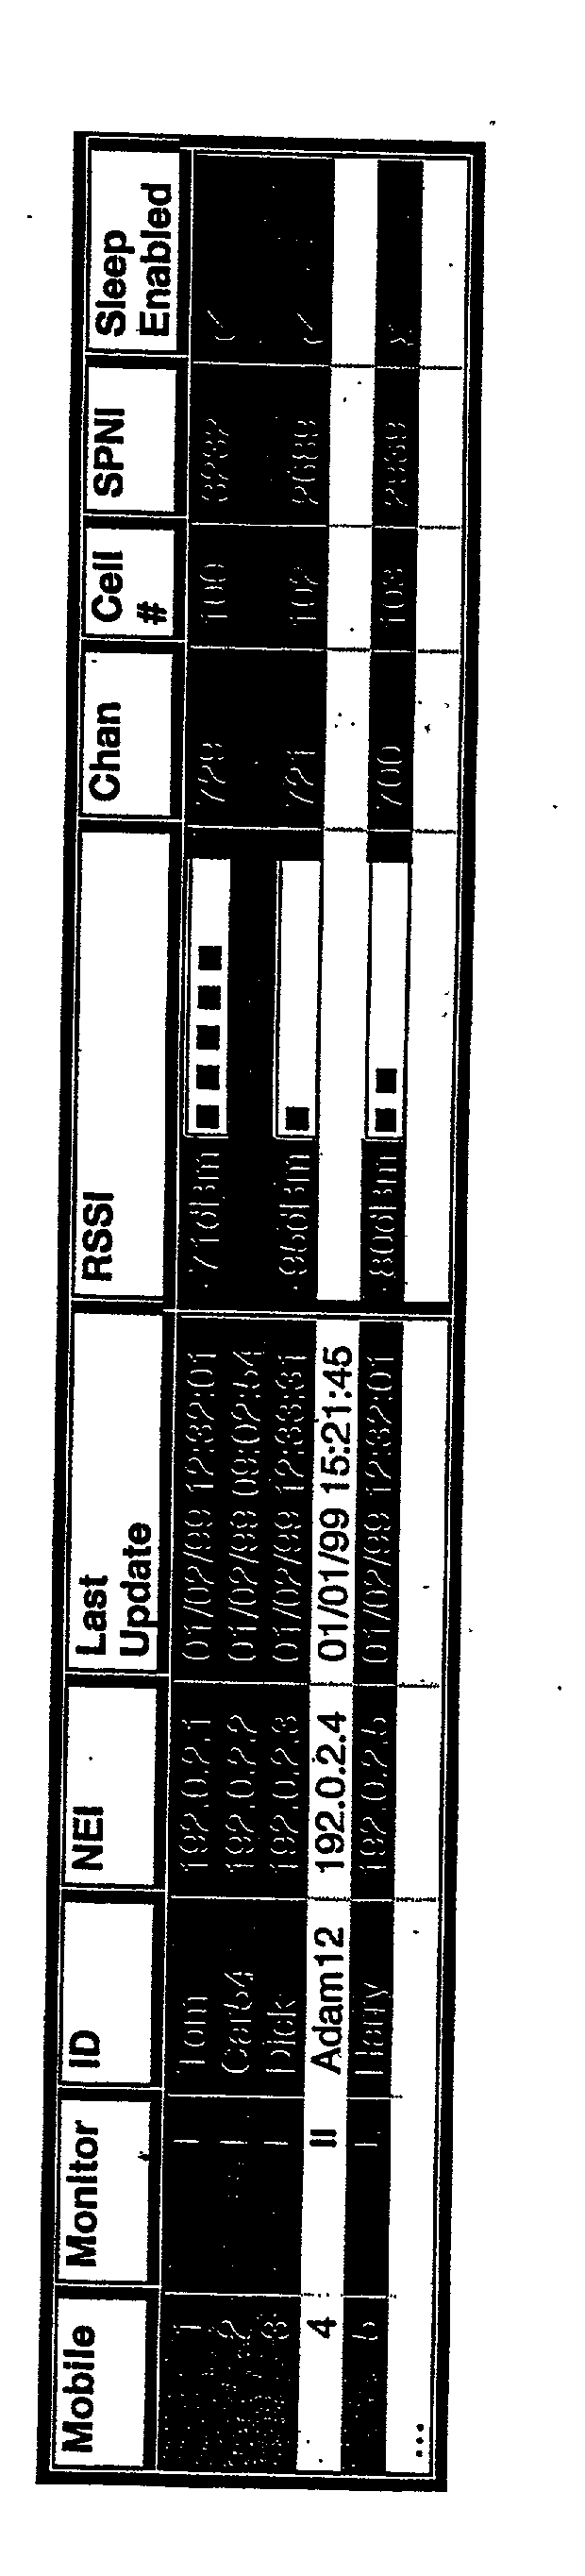 Figure US20030023720A1-20030130-P00002